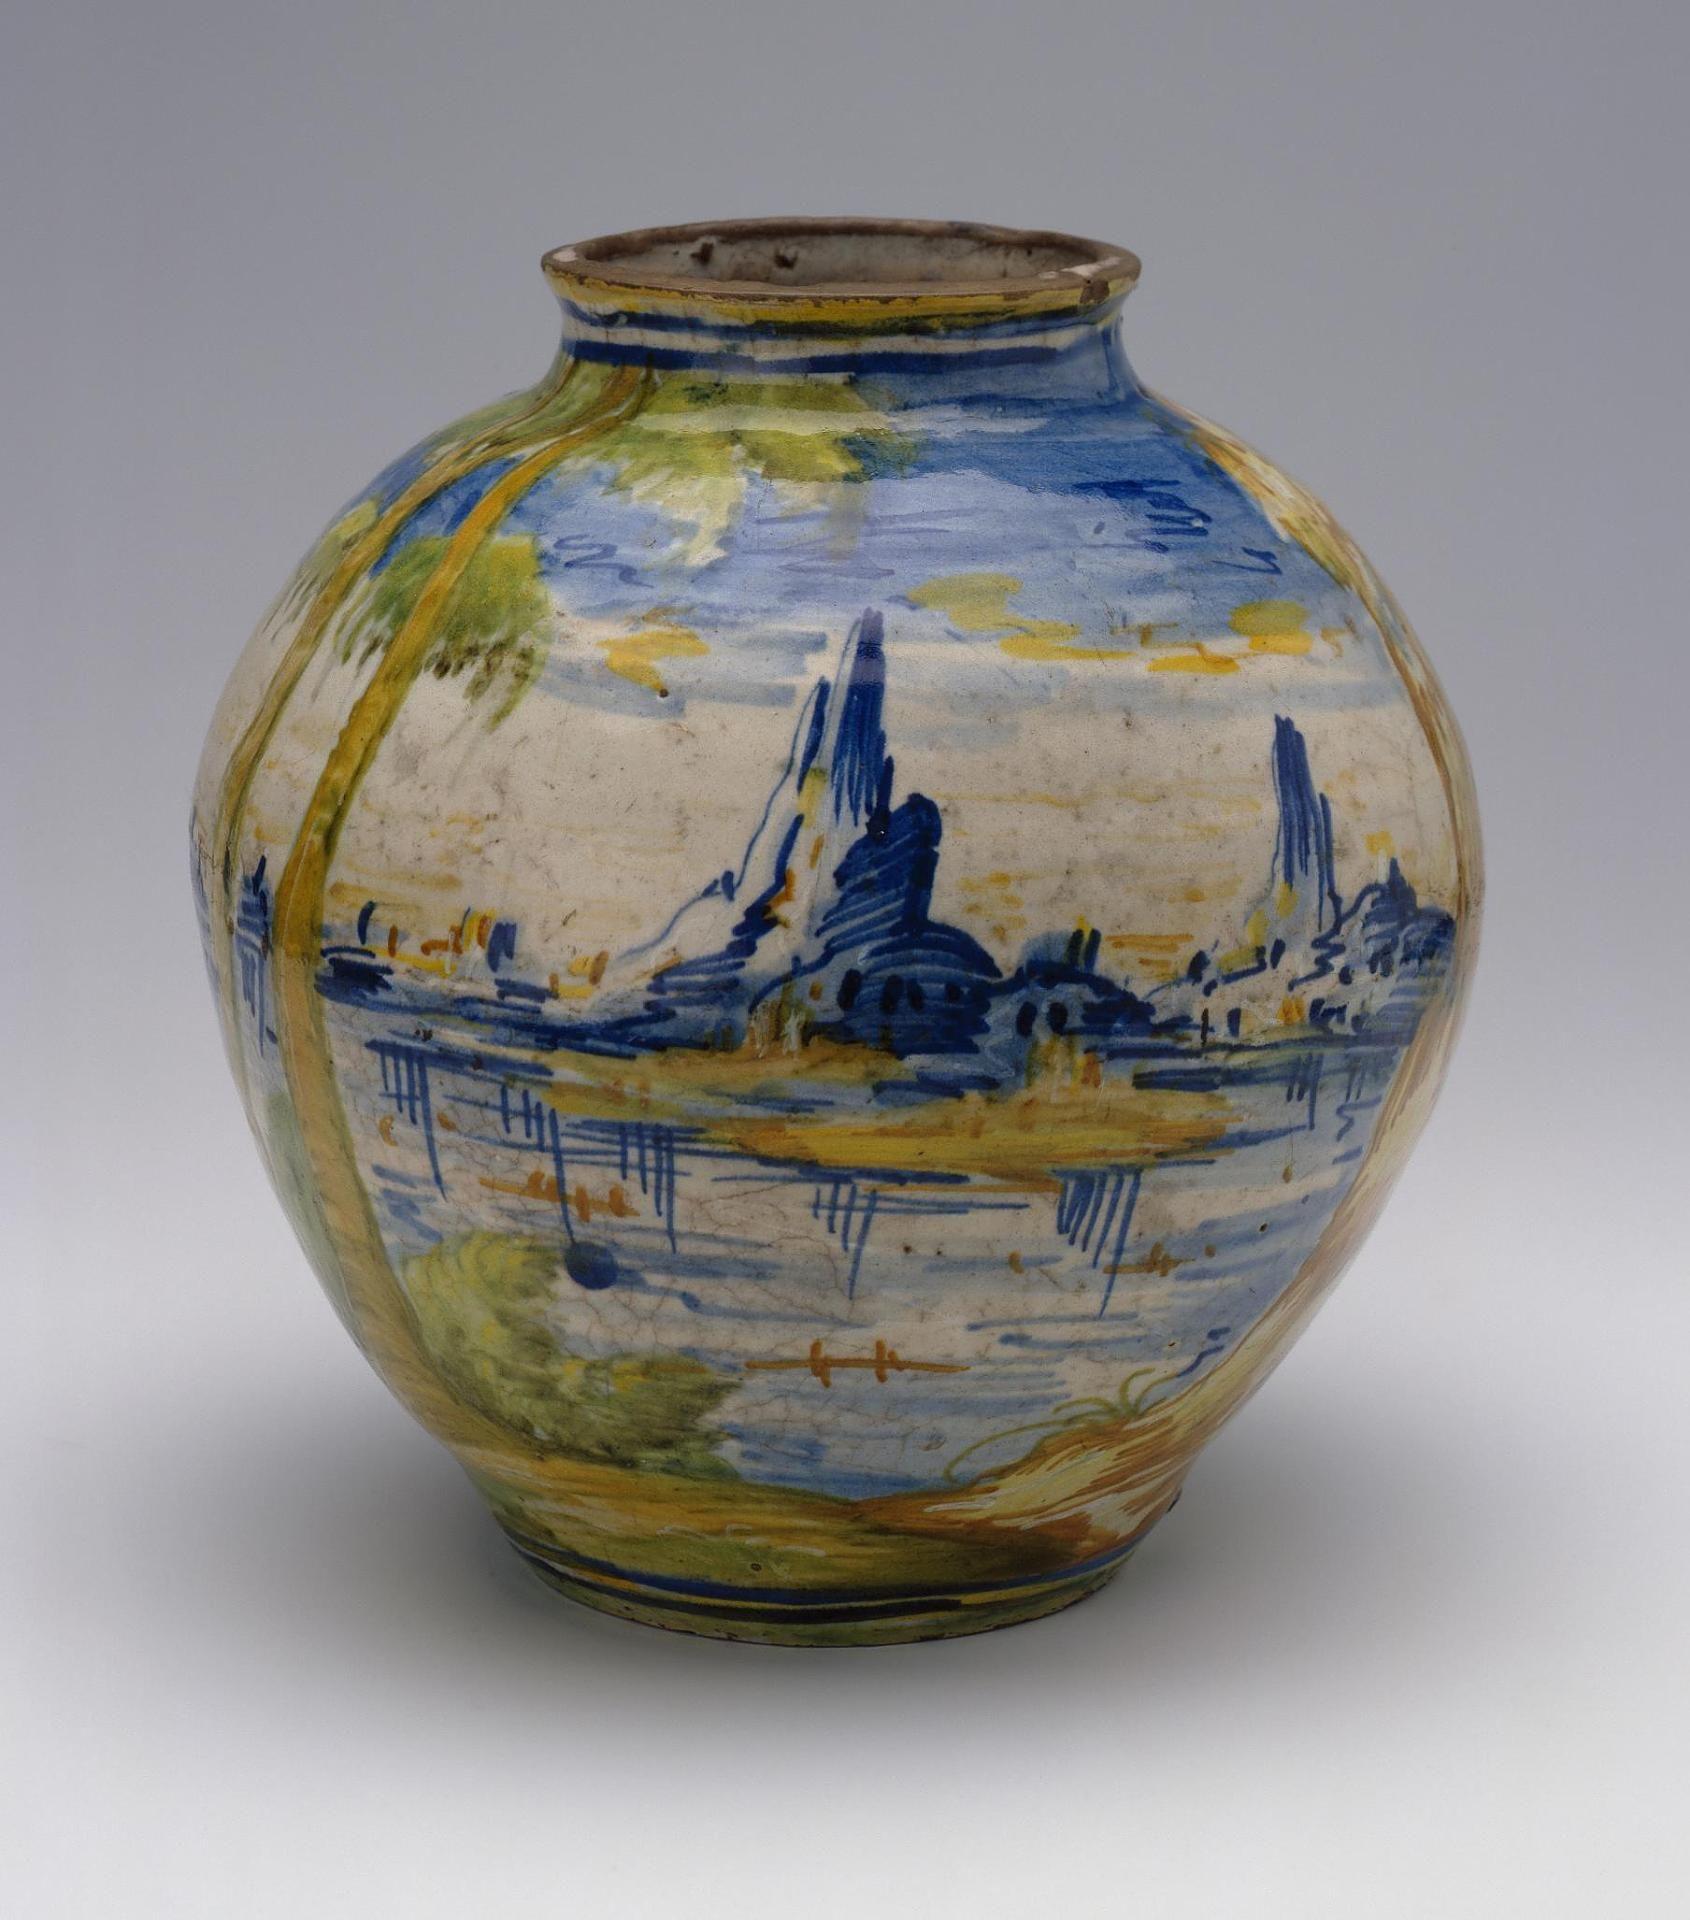 Art Works Majolica Pottery Italian Ceramics Majolica